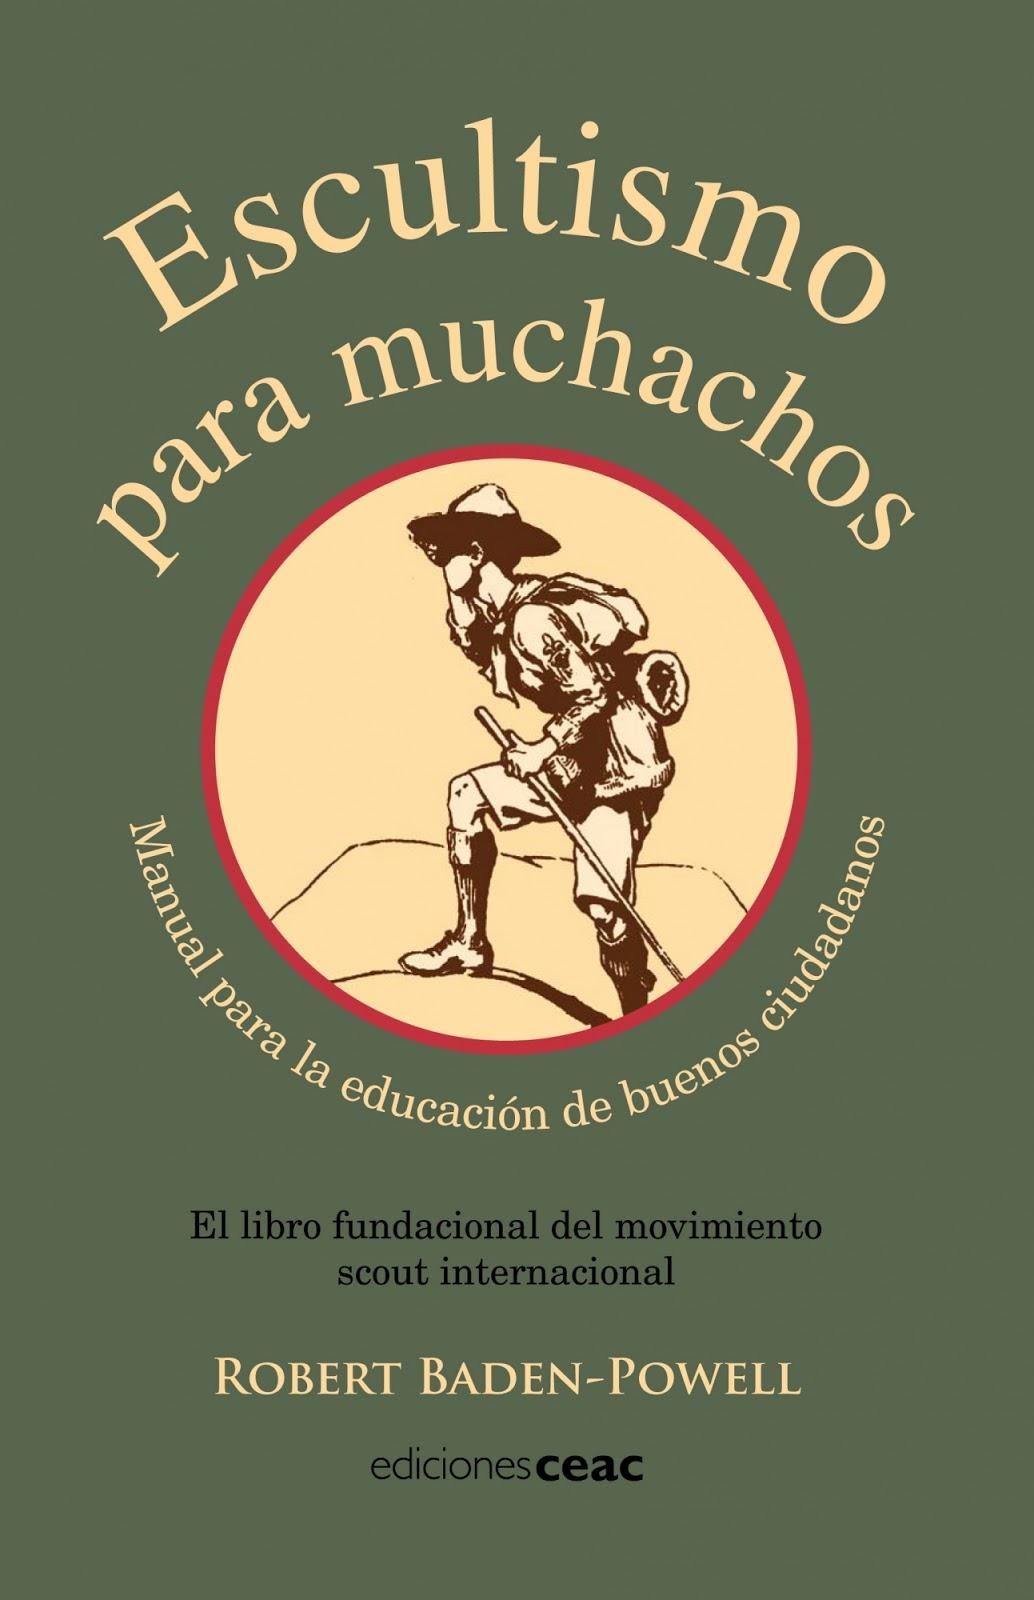 El libro de la selva - la enciclopedia libre